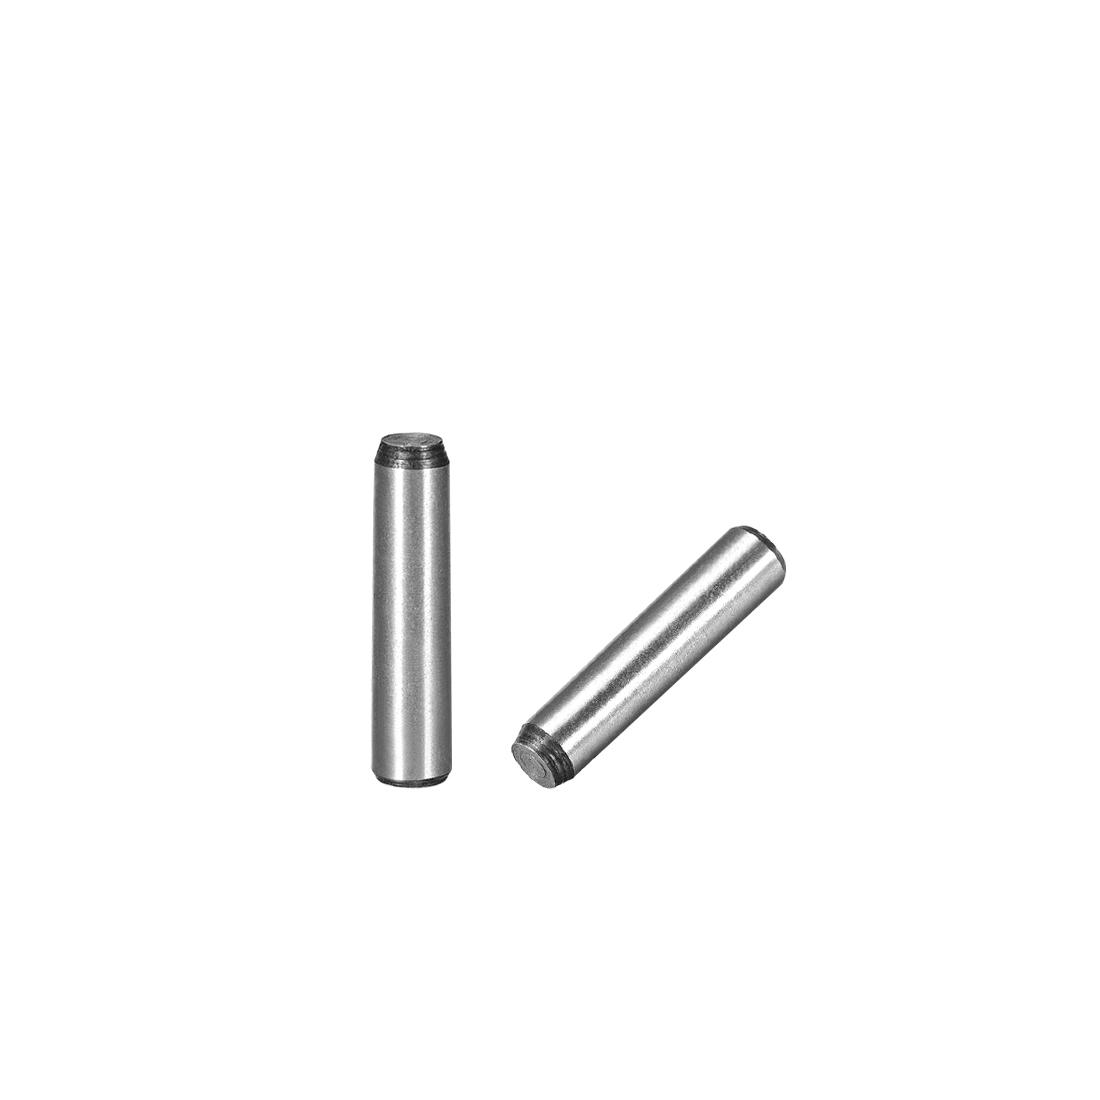 45# Carbon Steel GB117 25mm Length 6mm Small End Diameter 1:50 Taper Pin 5Pcs